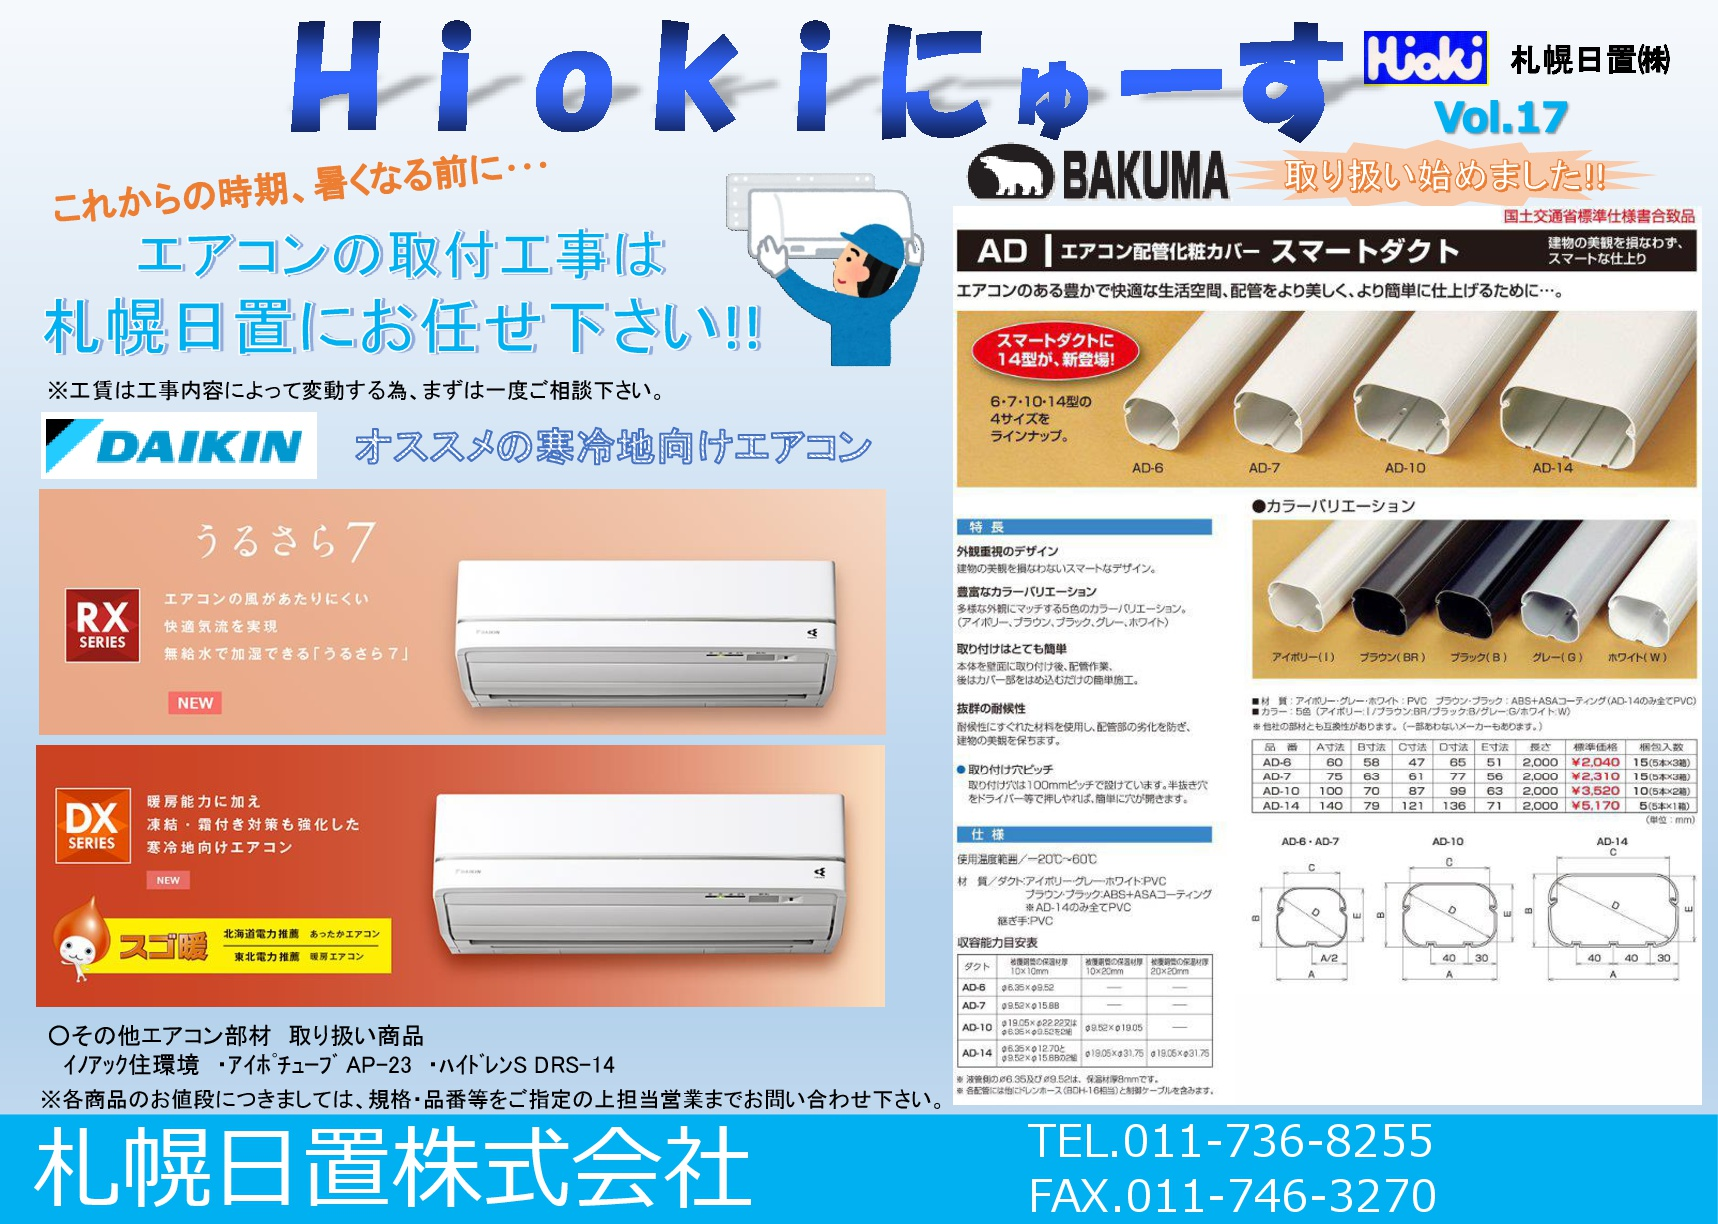 hiokiNEWSVol17-001.jpg